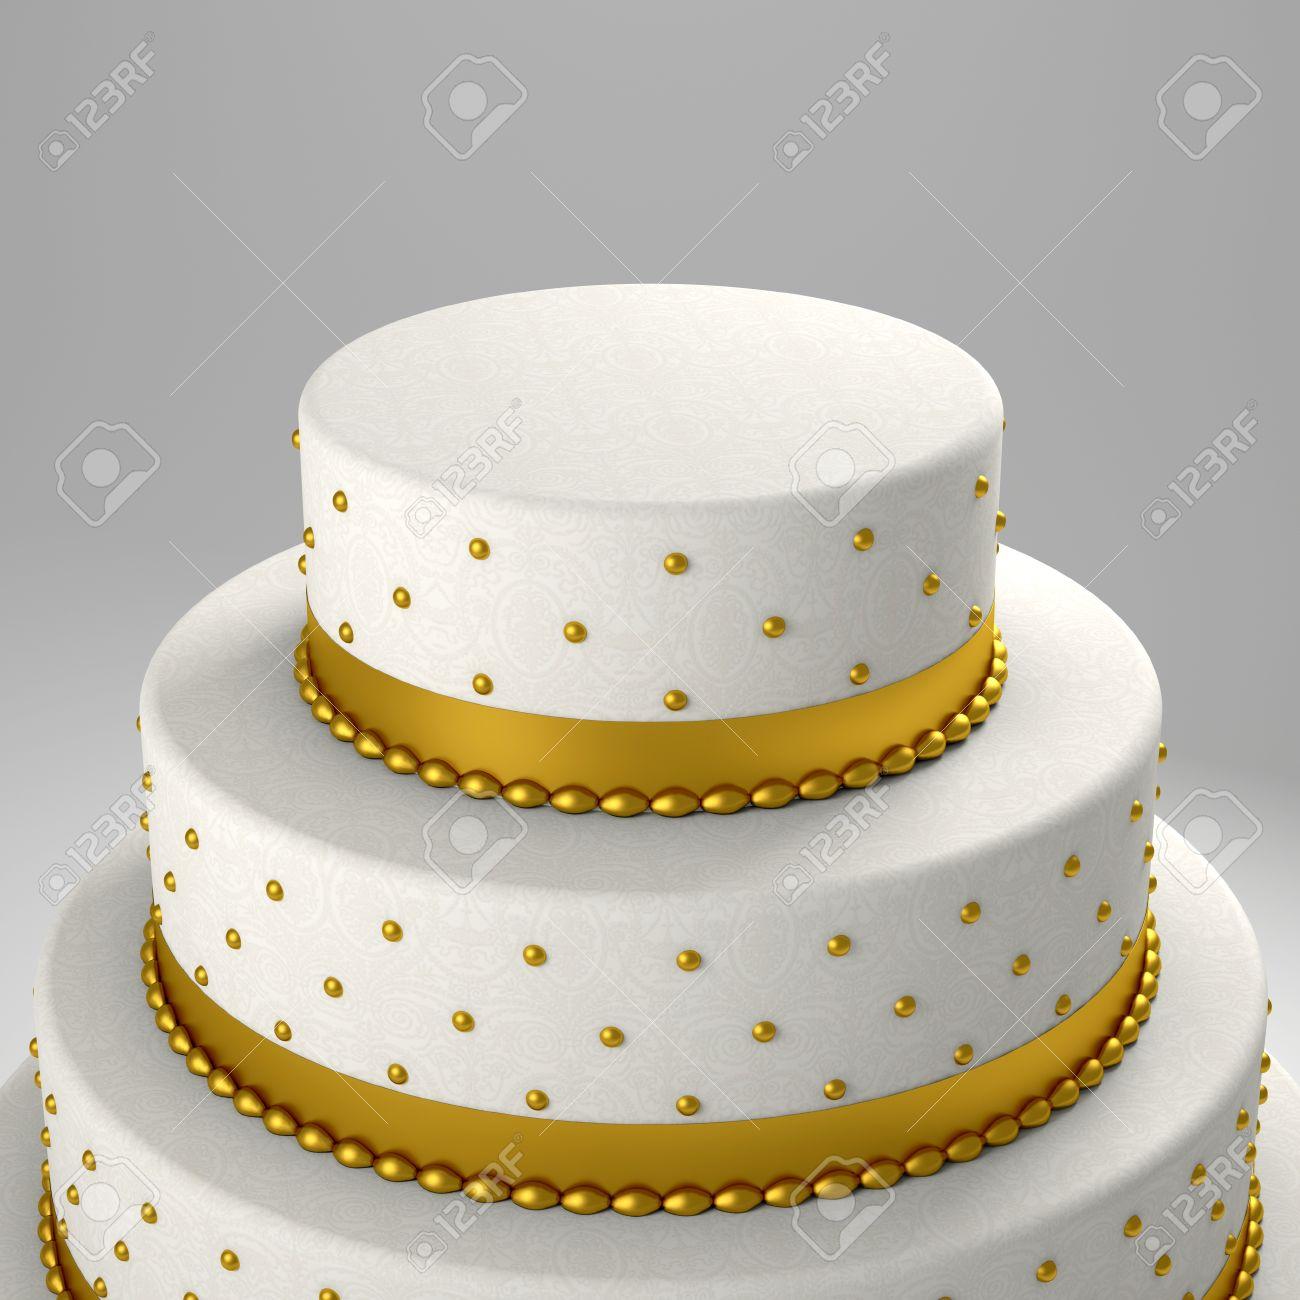 golden wedding cake 3d image